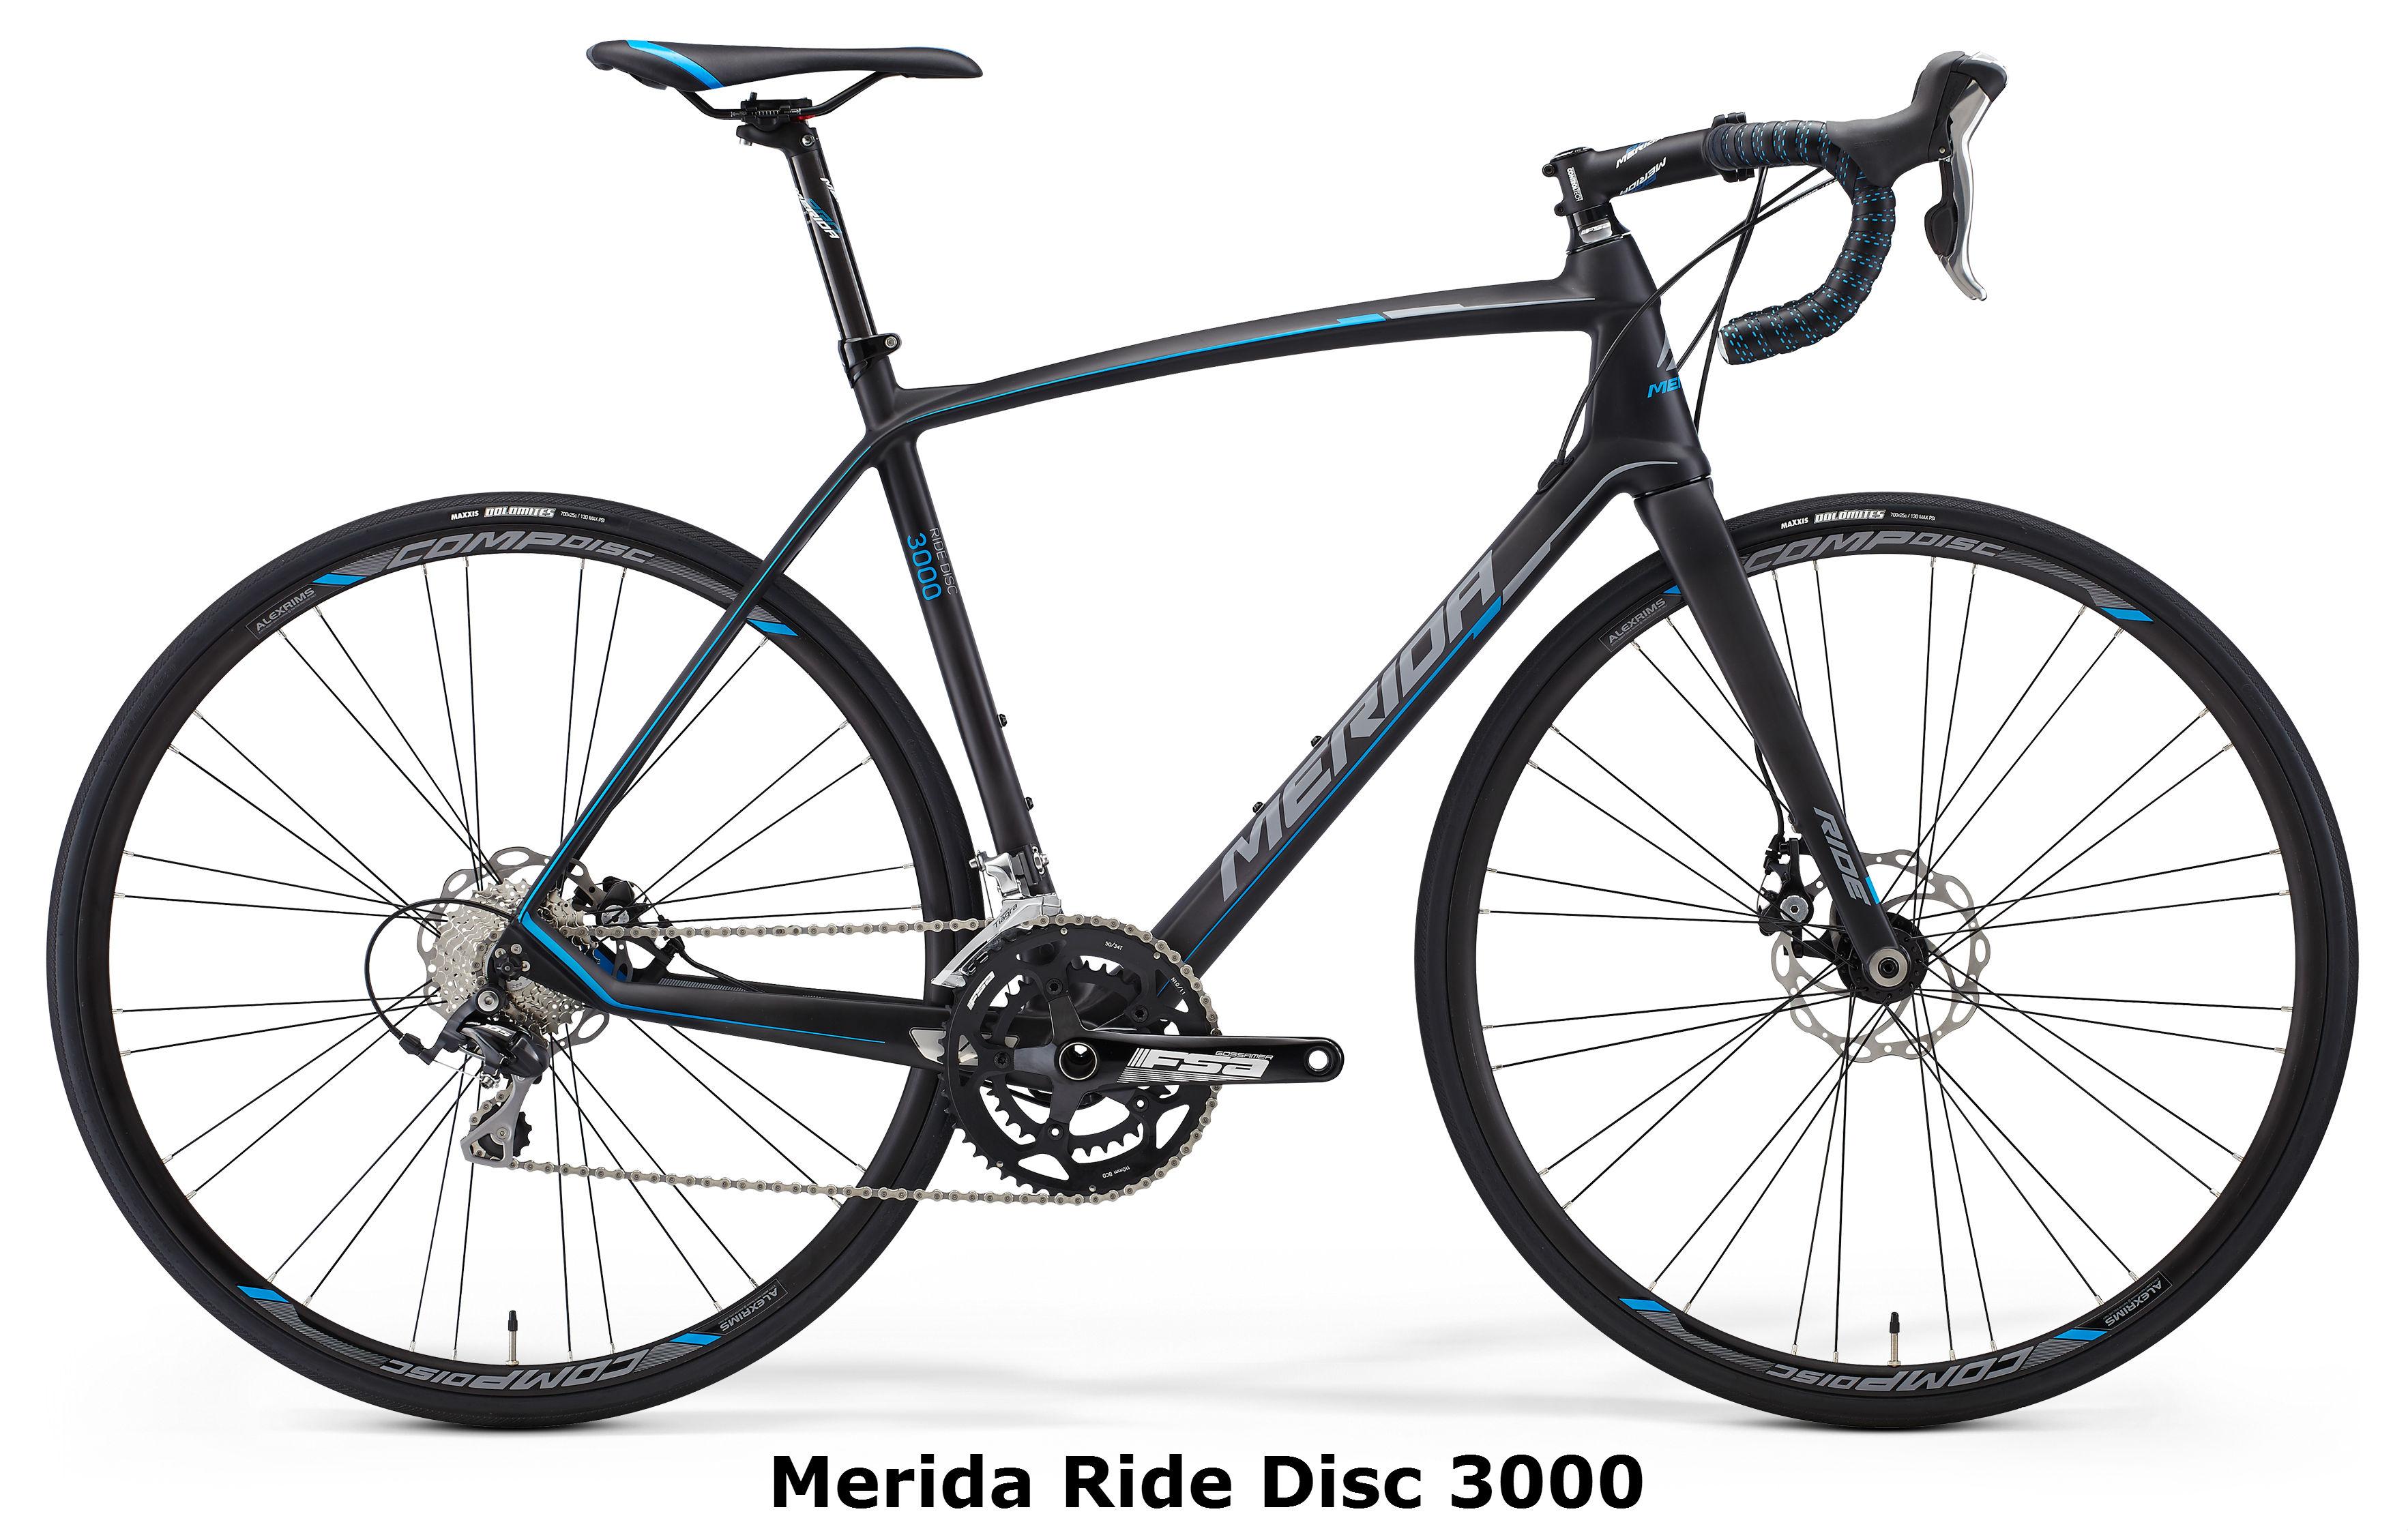 Merida Ride Disc